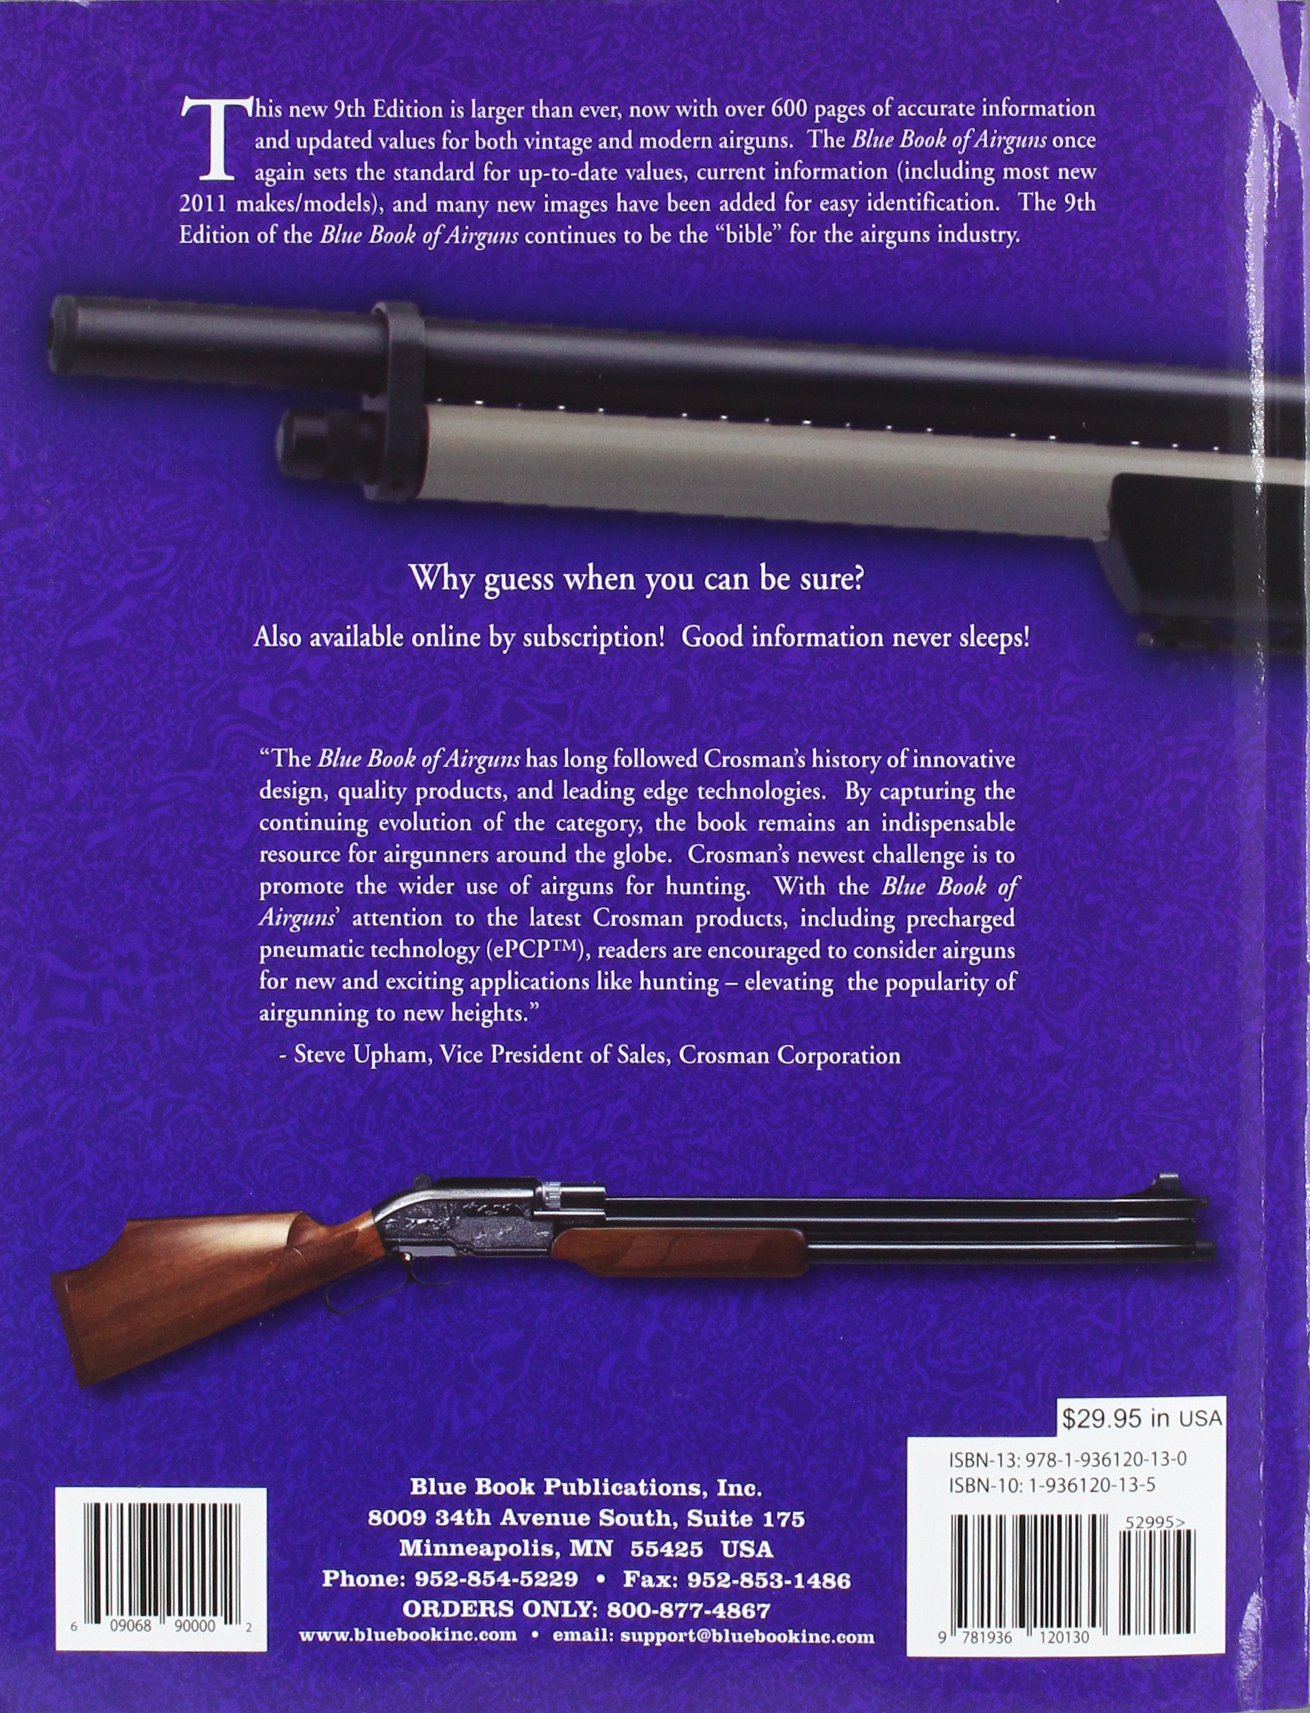 Blue Book of Airguns, 9th Edition: Dr. Robert D. Beeman, John B. Allen,  S.P. Fjestad: 9781936120130: Amazon.com: Books